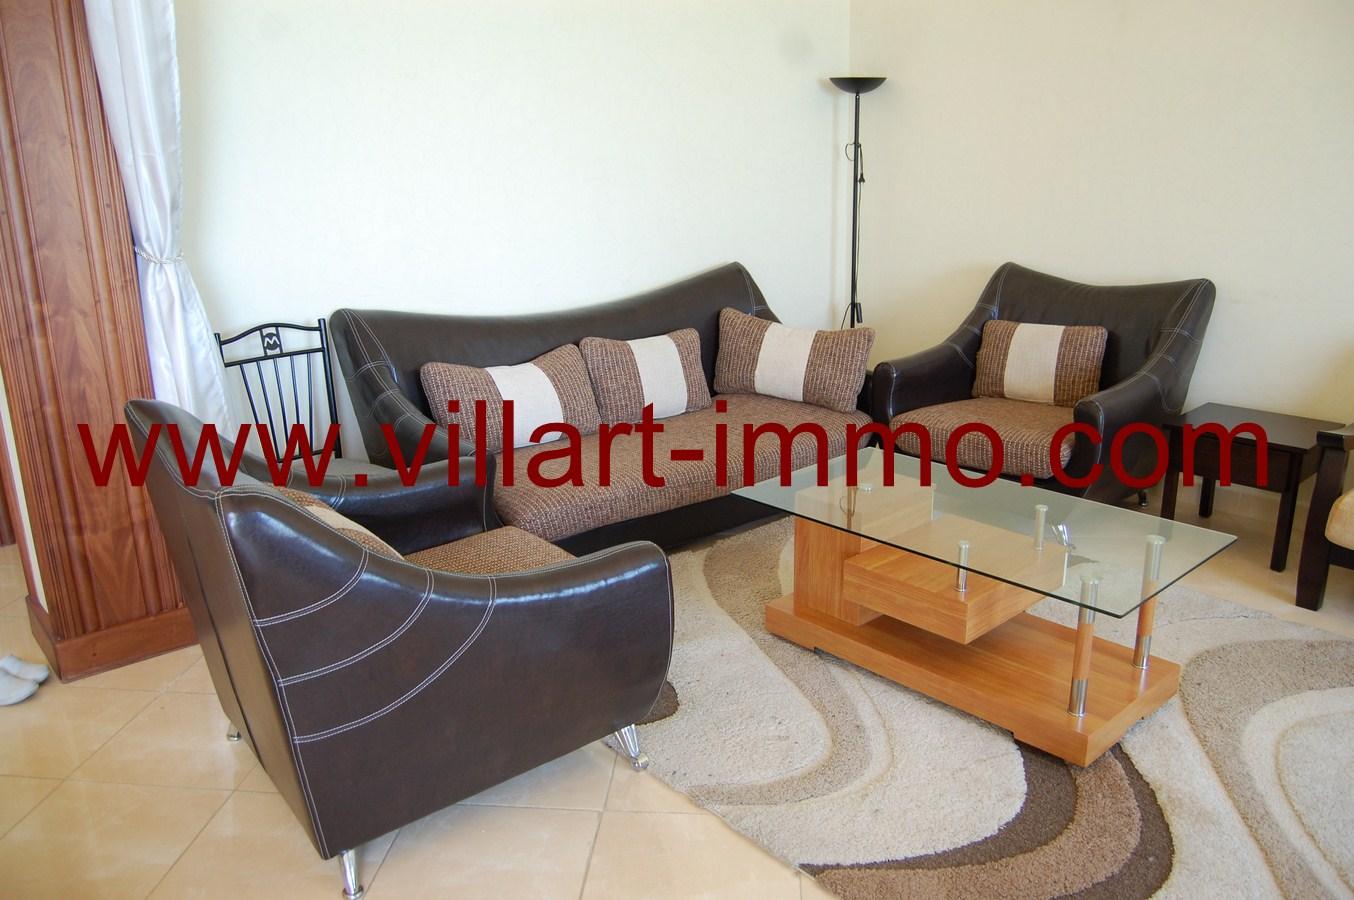 2-Location-Tanger-Appartement-Playa-L447-Salon